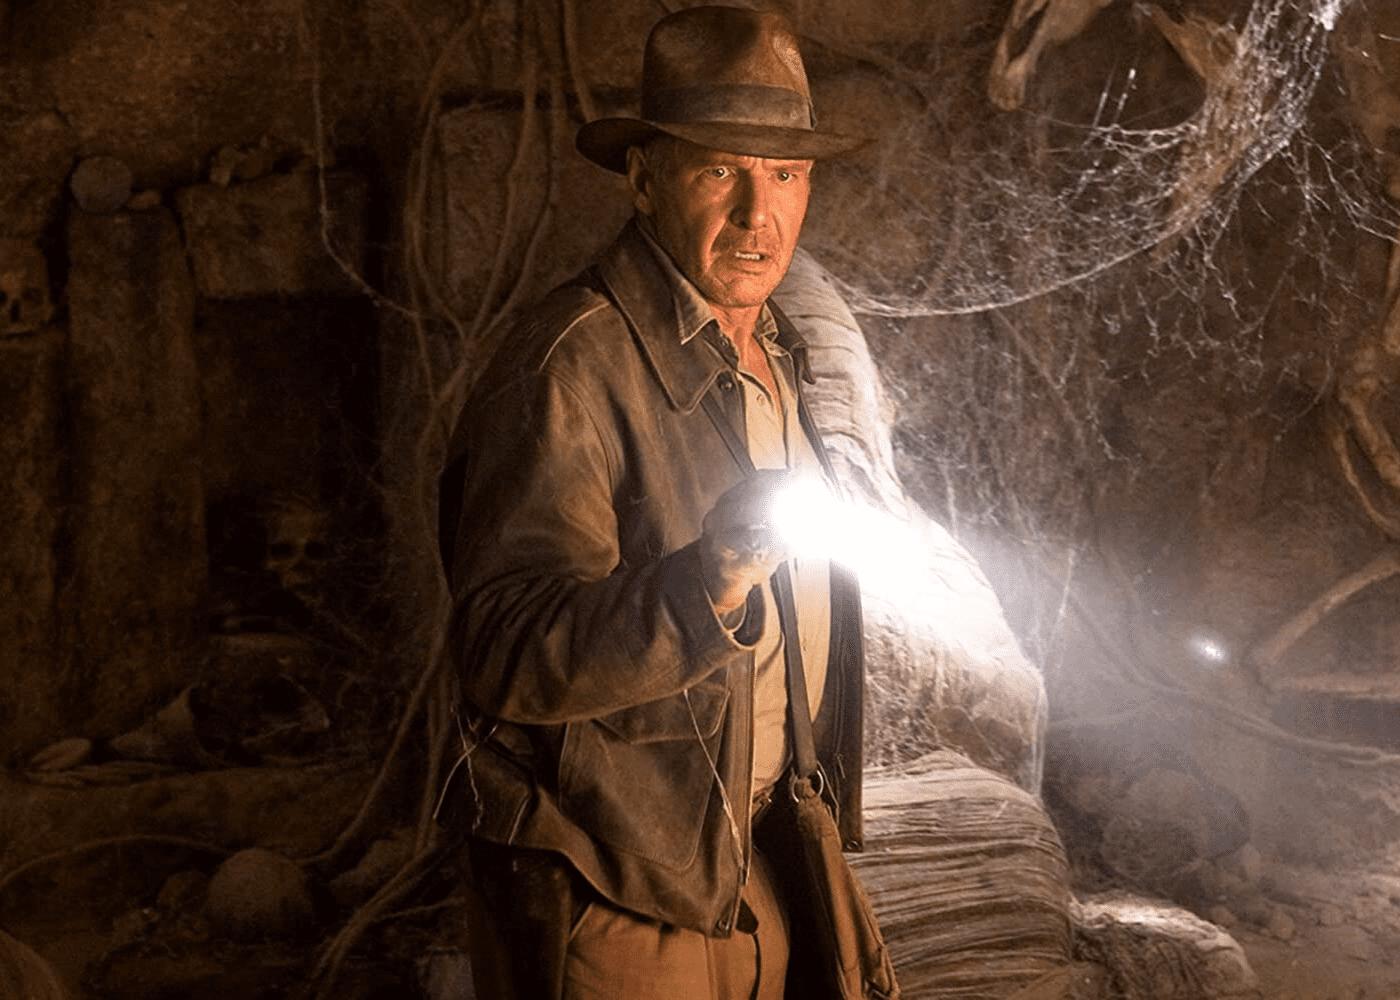 Indiana Jones | movie marathons with the kids